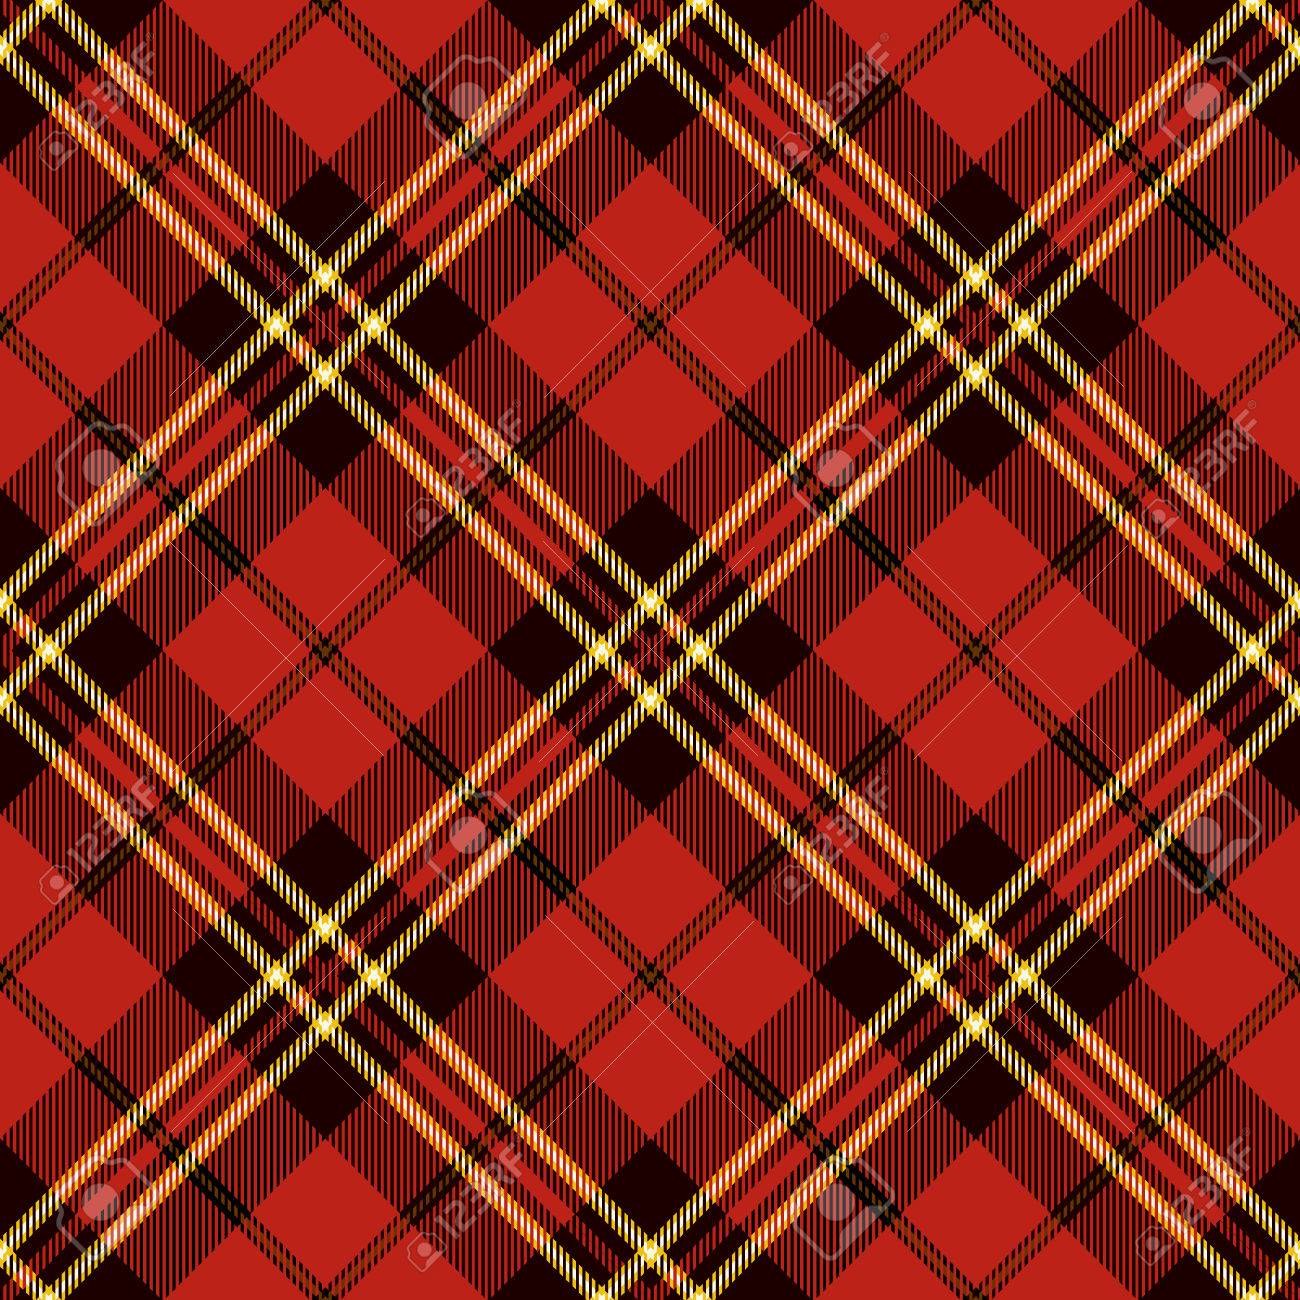 Tartan Seamless Pattern. Trendy Vector Illustration for Wallpapers. Seamless Tartan Tiles. Traditional Scottish Ornament. Tartan Plaid Inspired Background. - 66207601